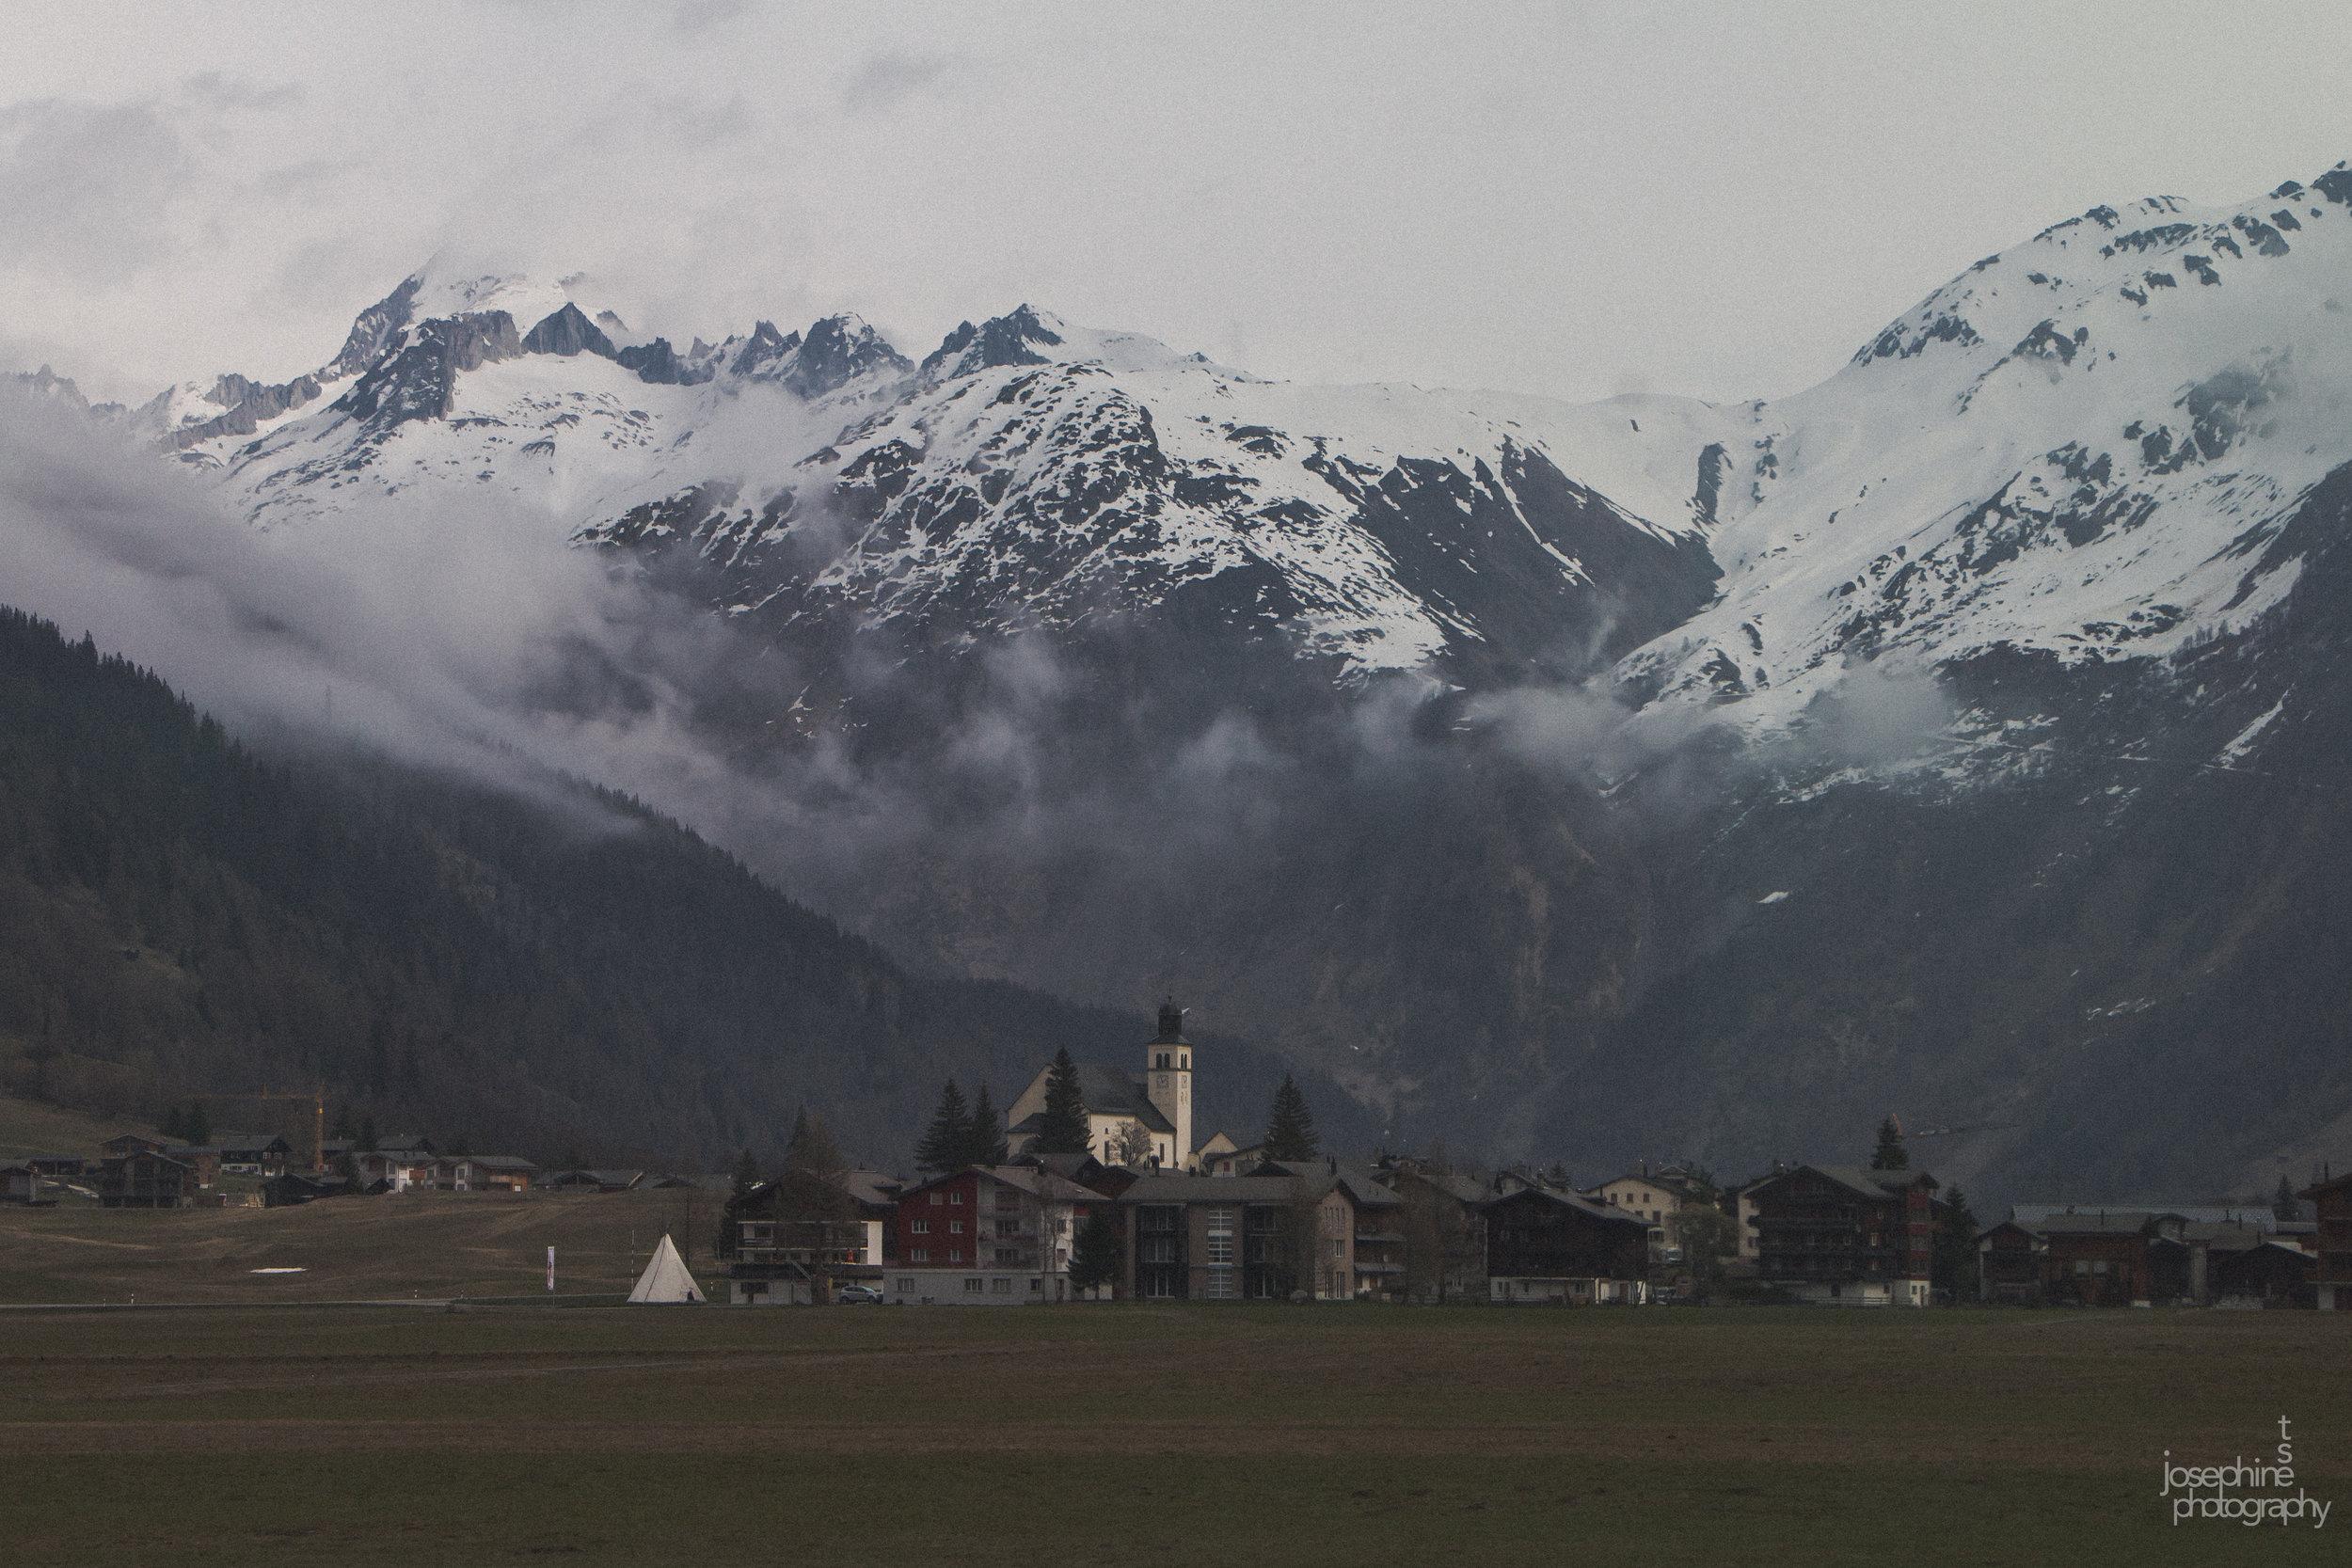 Glacier Express  Zermatt to St. Moritz, Switzerland, 04/17